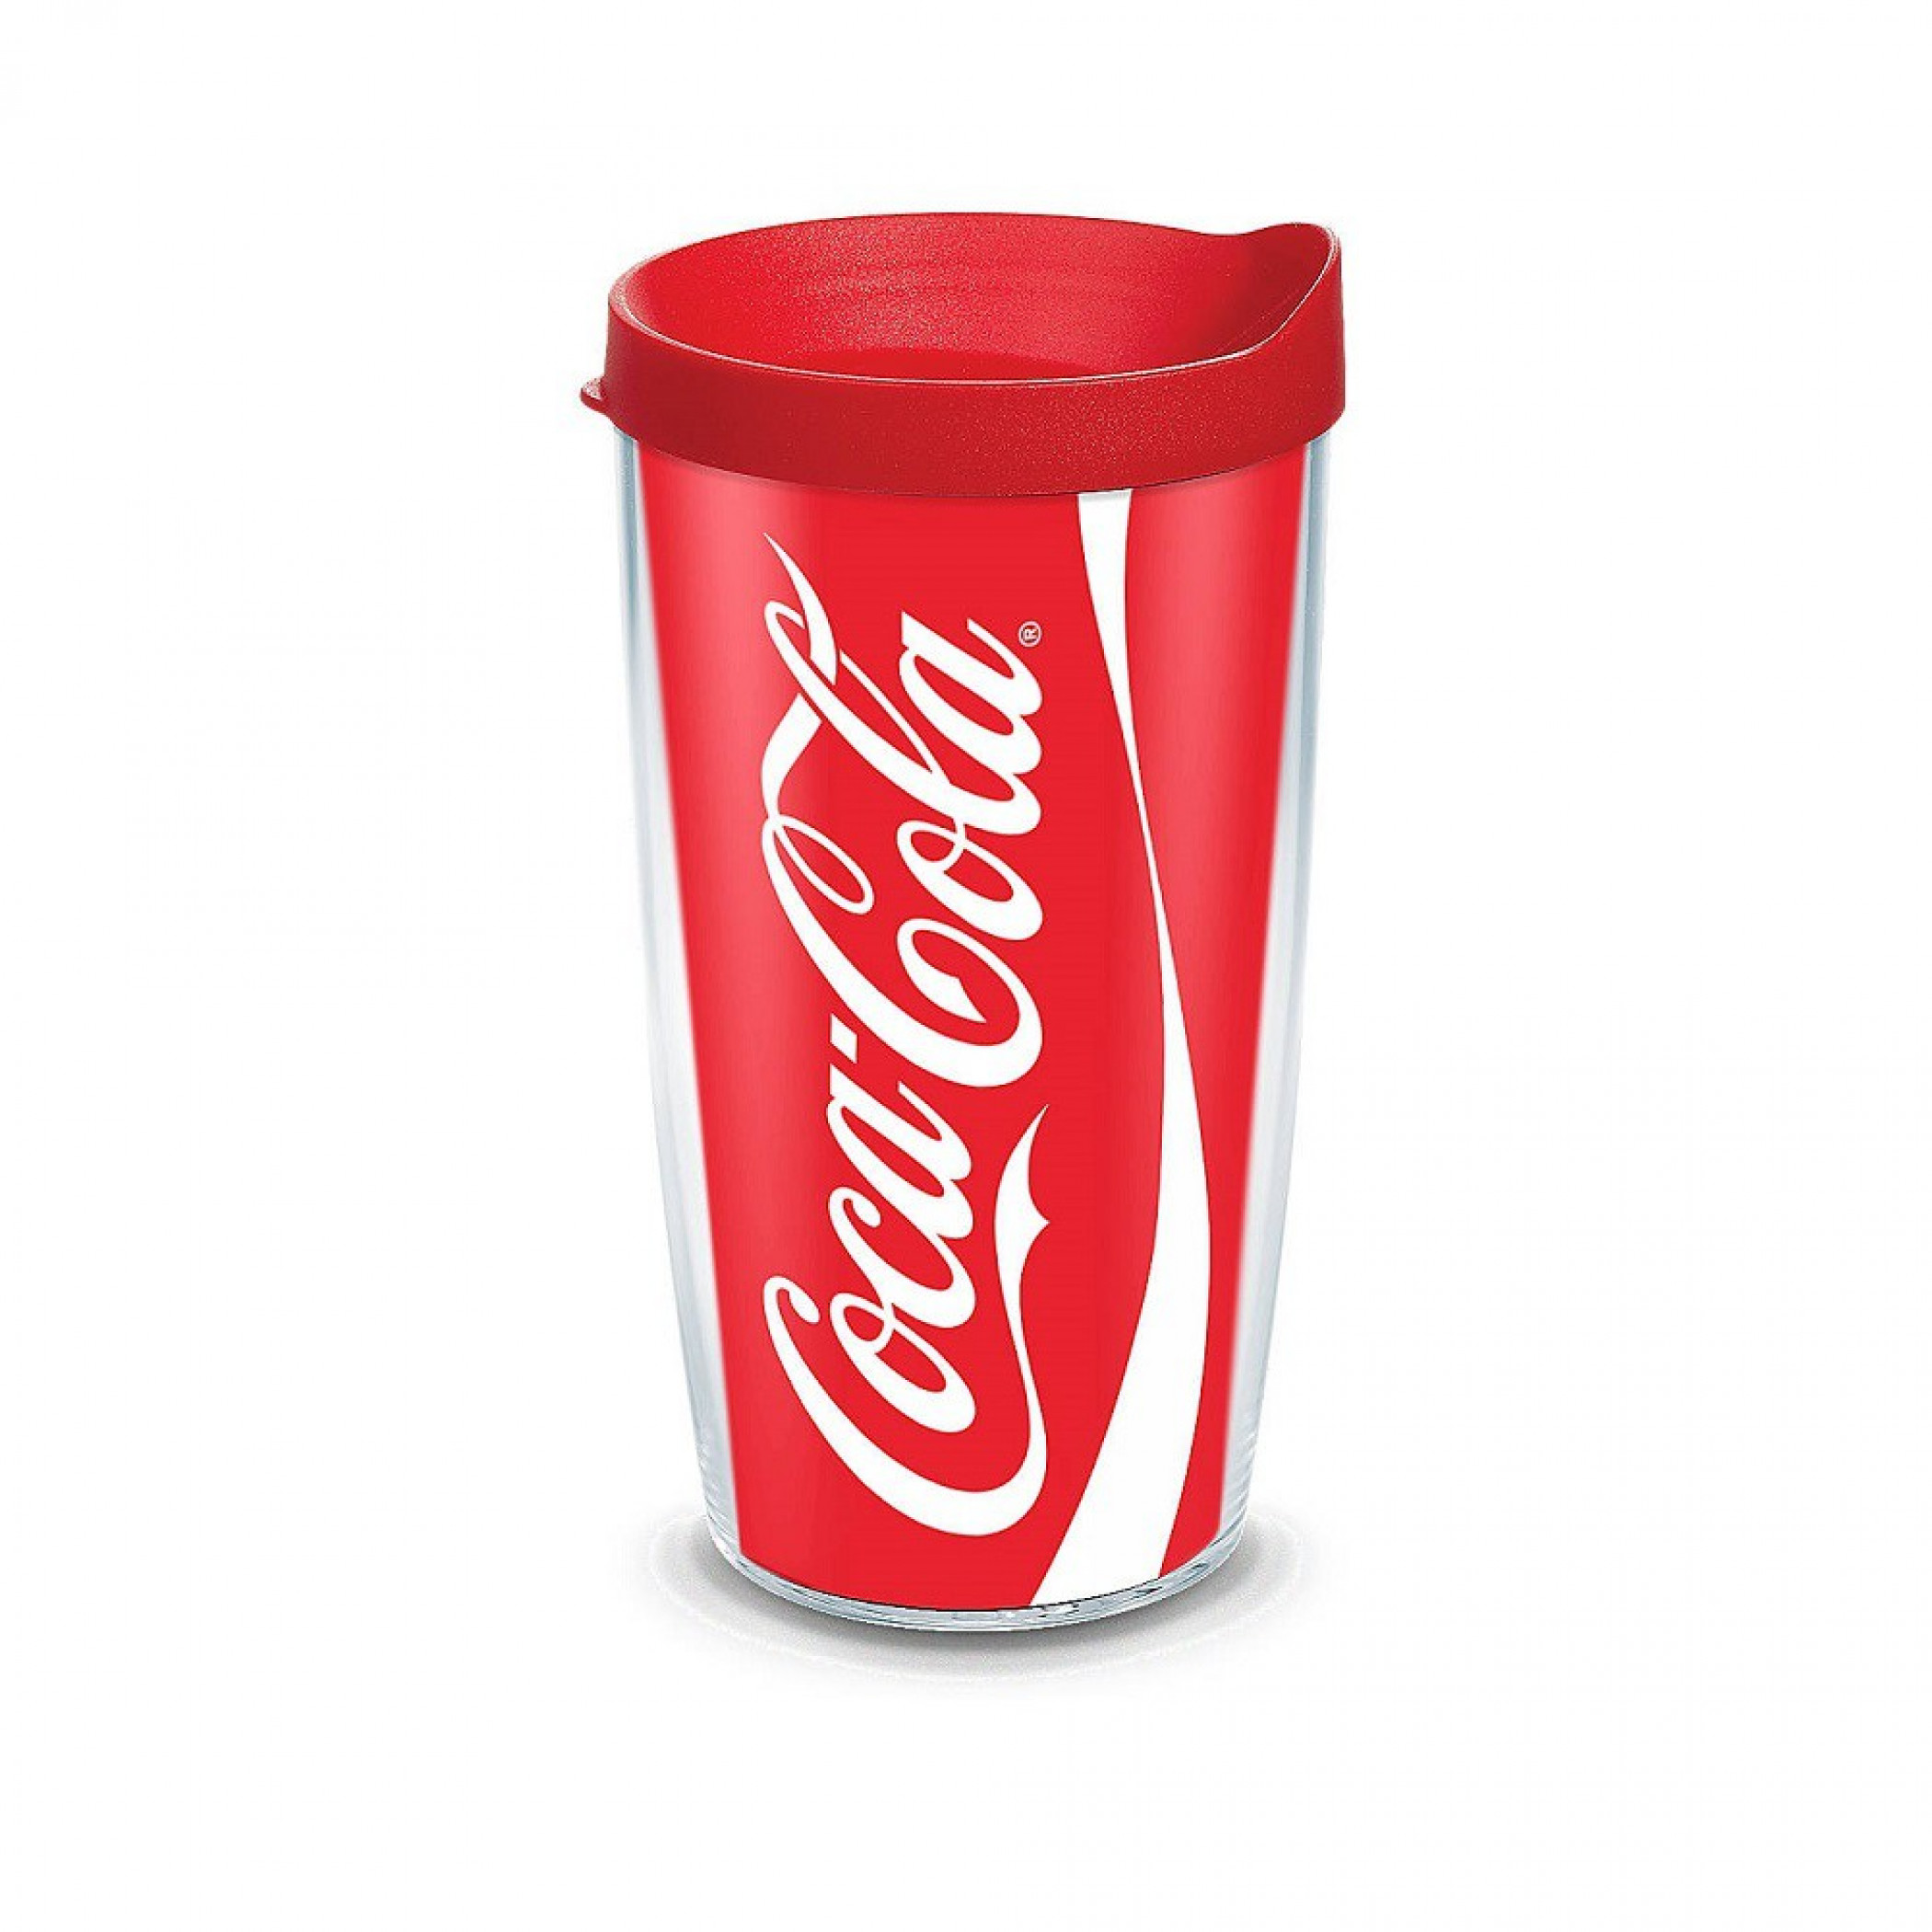 Coca-Cola 16 Ounce Plastic Tumbler